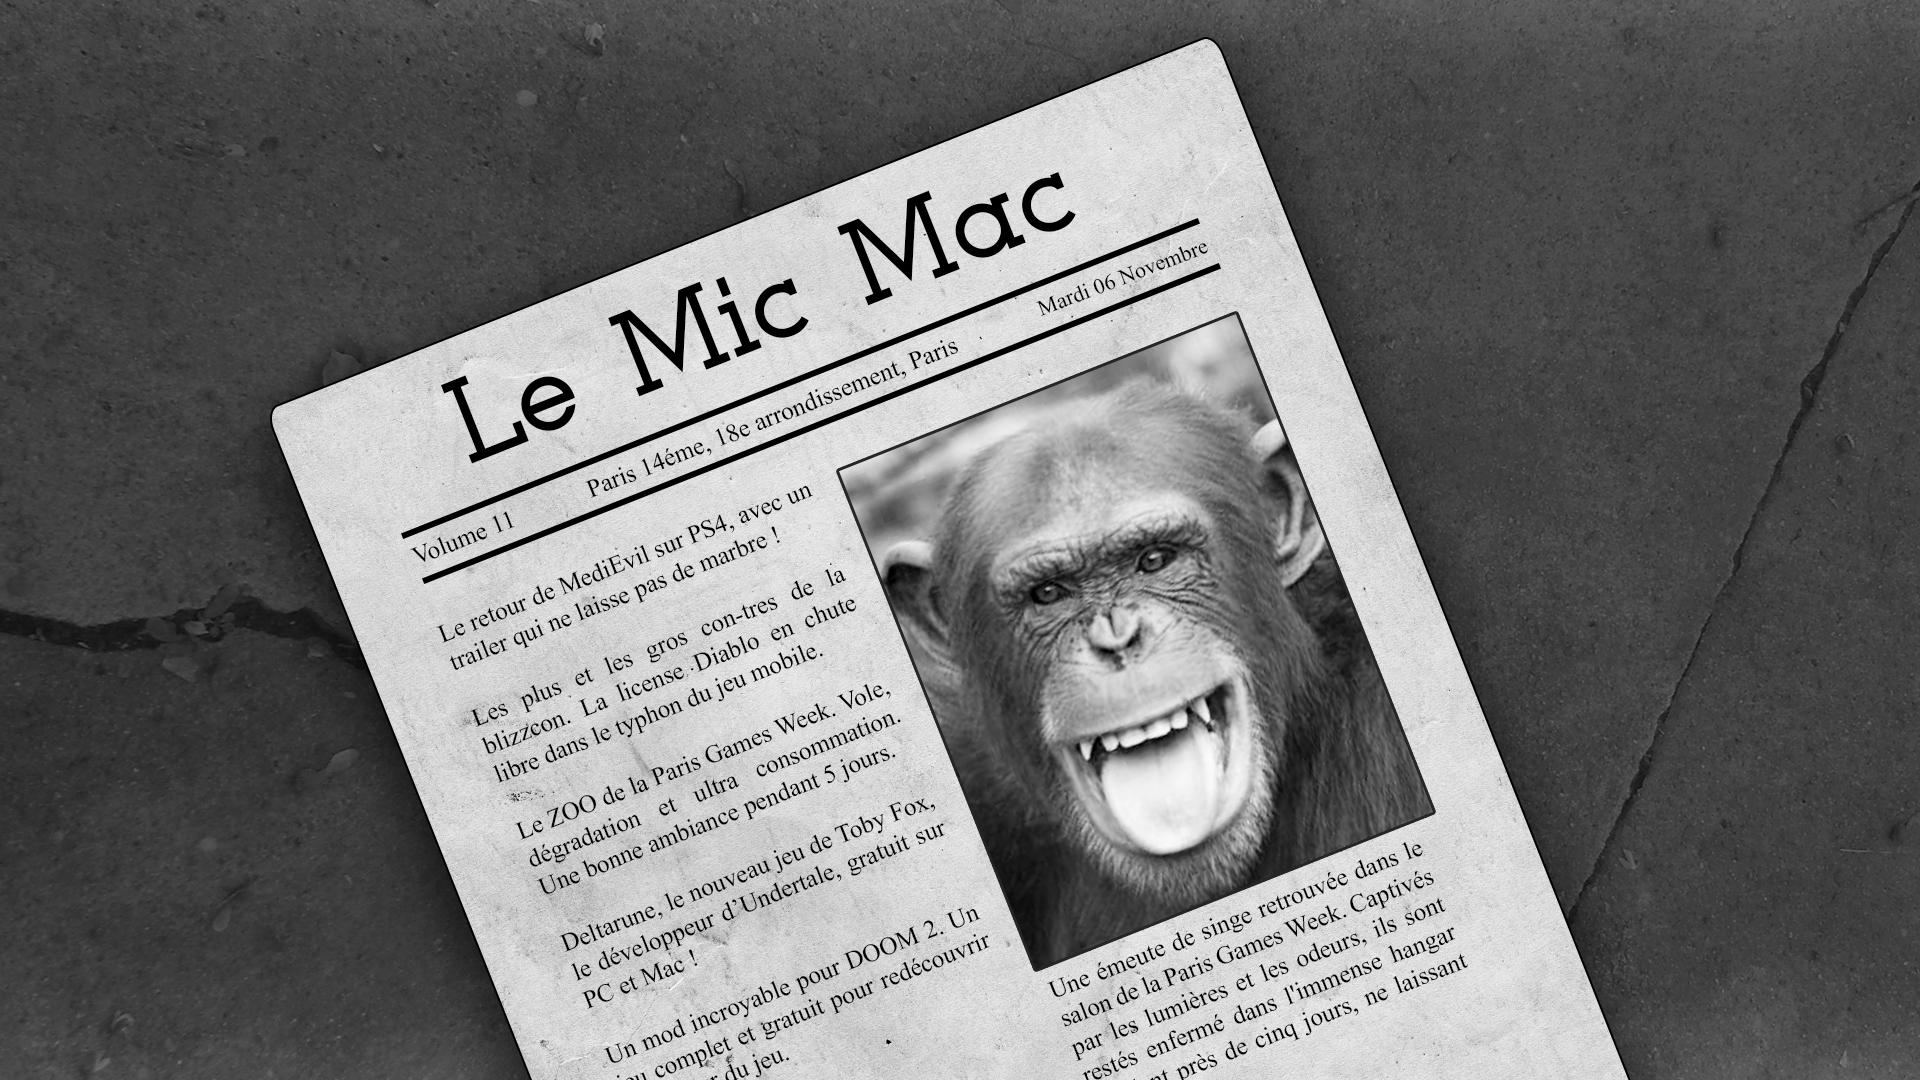 Au Tour du Mic – Mic Mac #11: 24/10/2018 au 05/11/2018